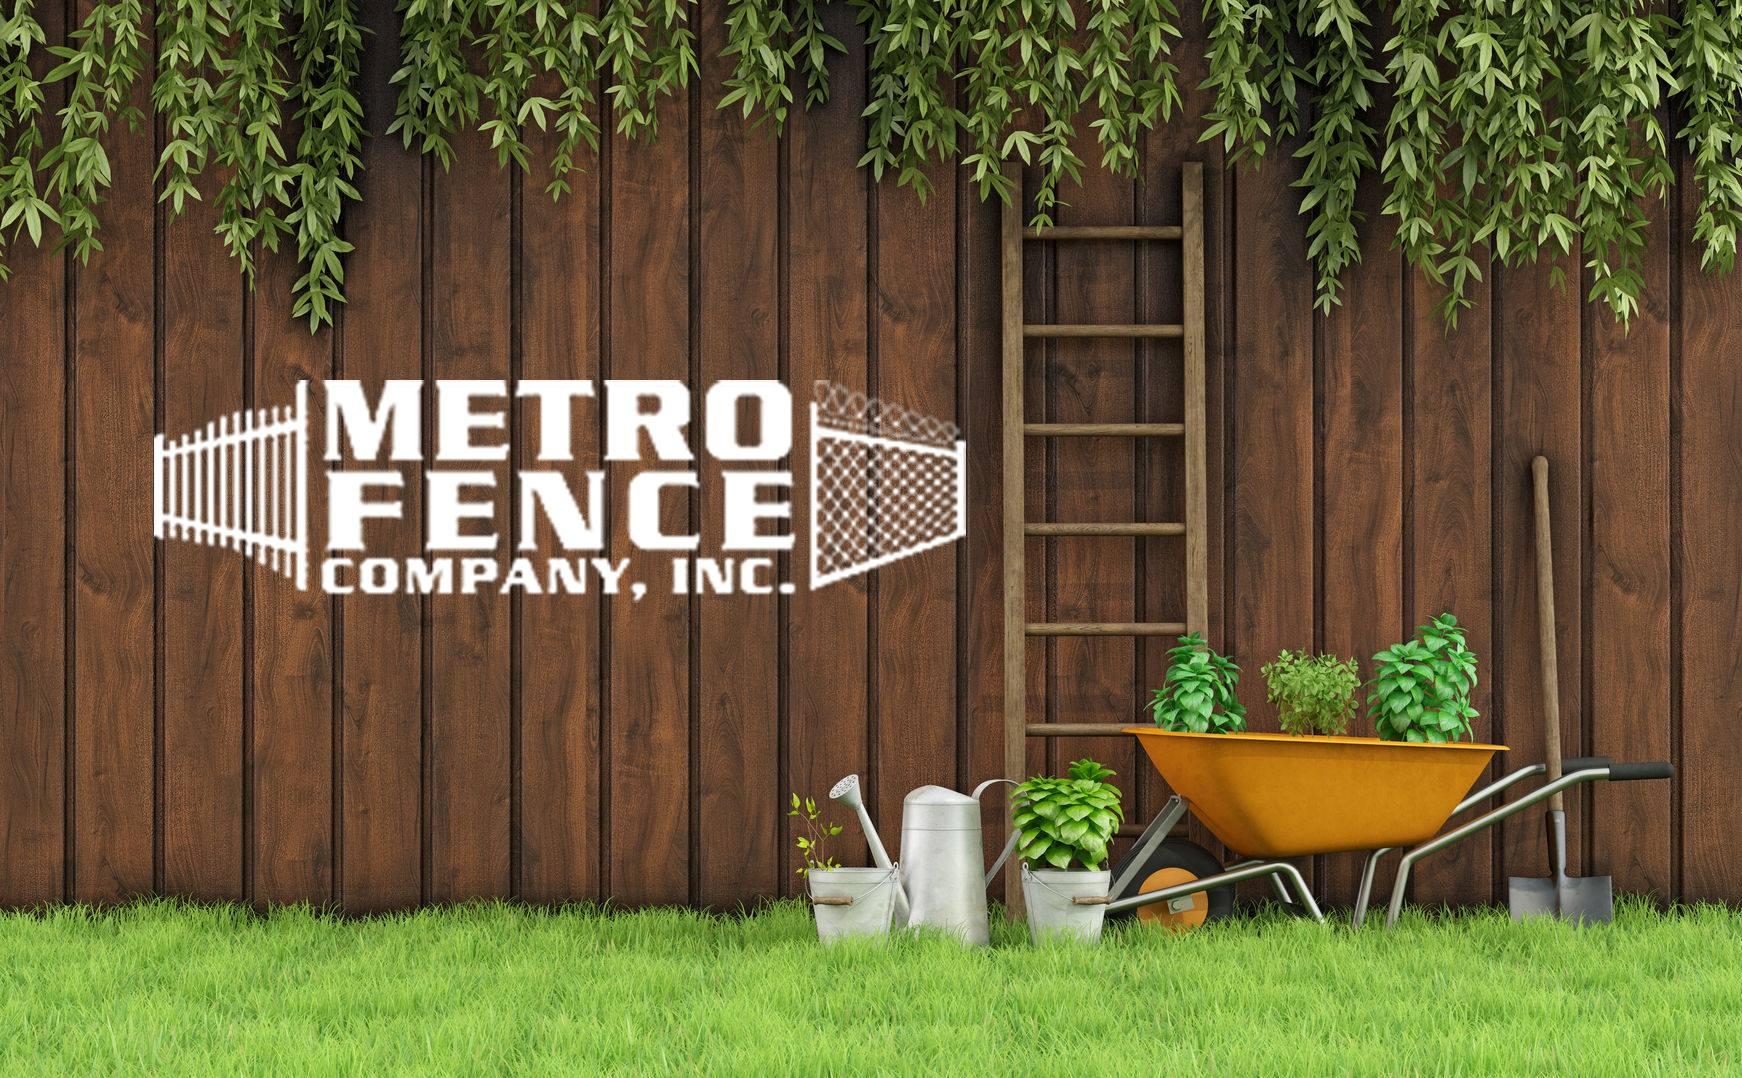 Metro Fence Company